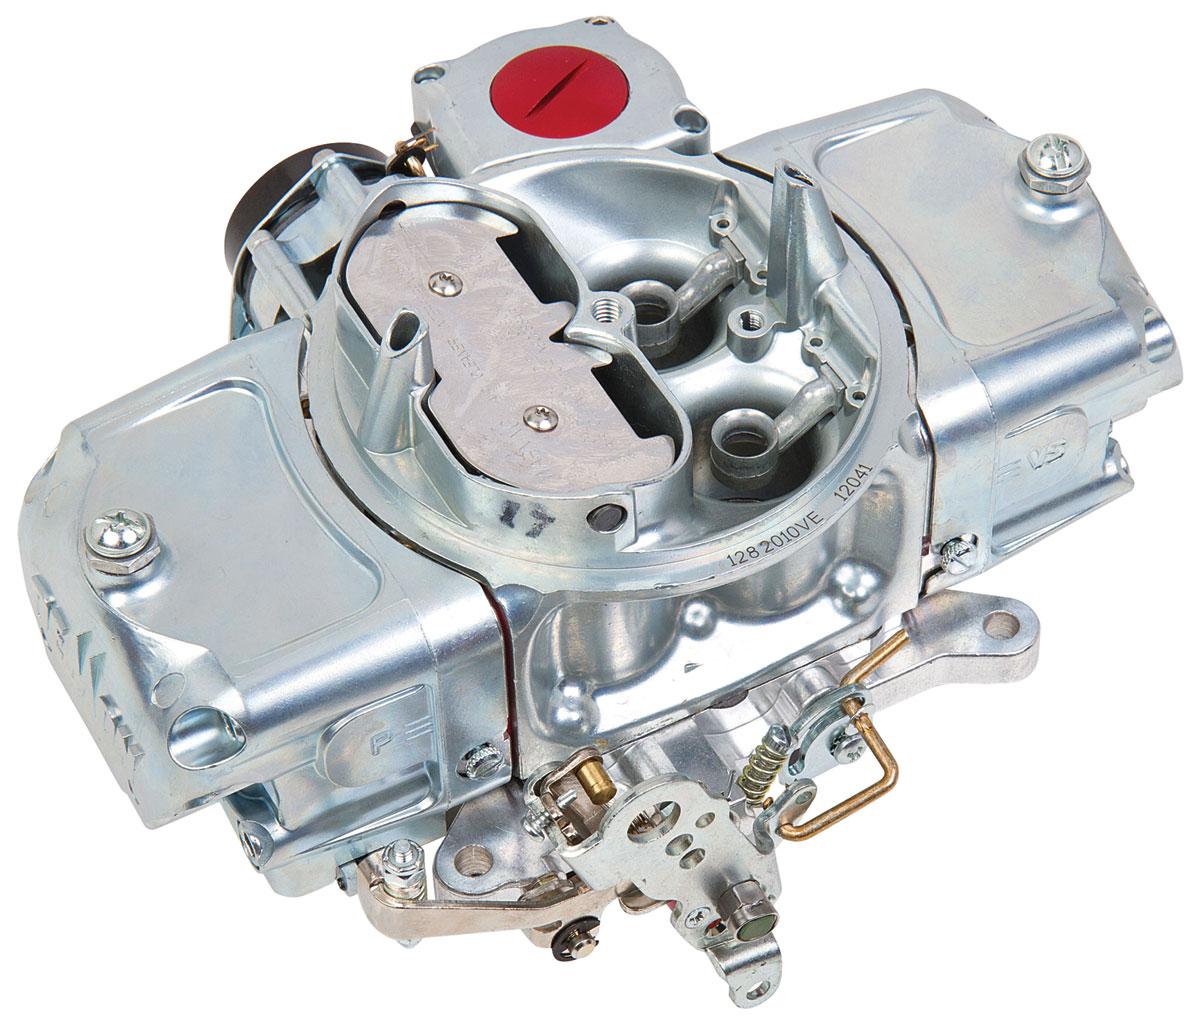 Photo of Carburetors, Speed Demon Vacuum Secondary 650 CFM, no choke